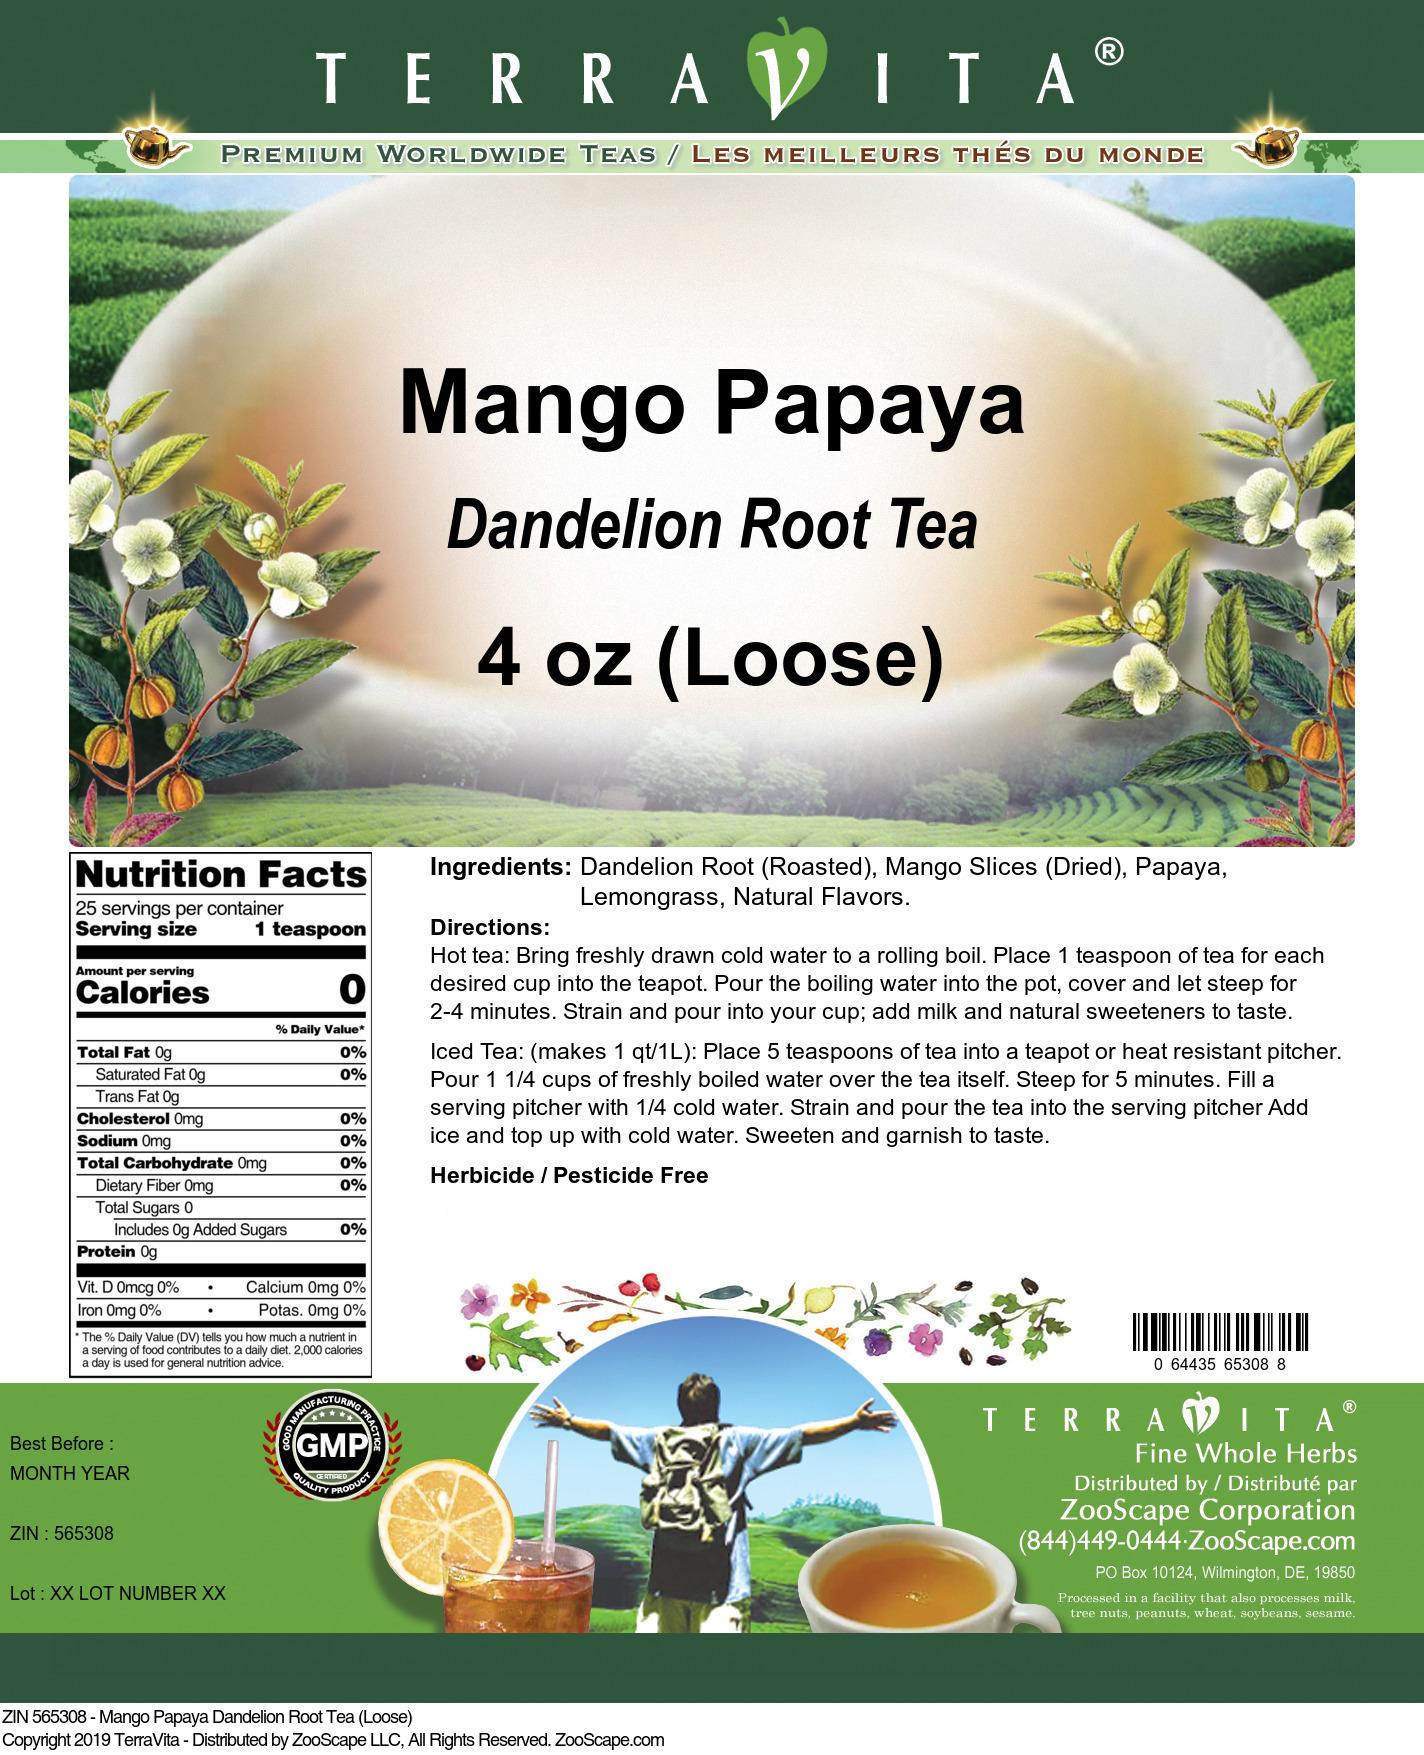 Mango Papaya Dandelion Root Tea (Loose)